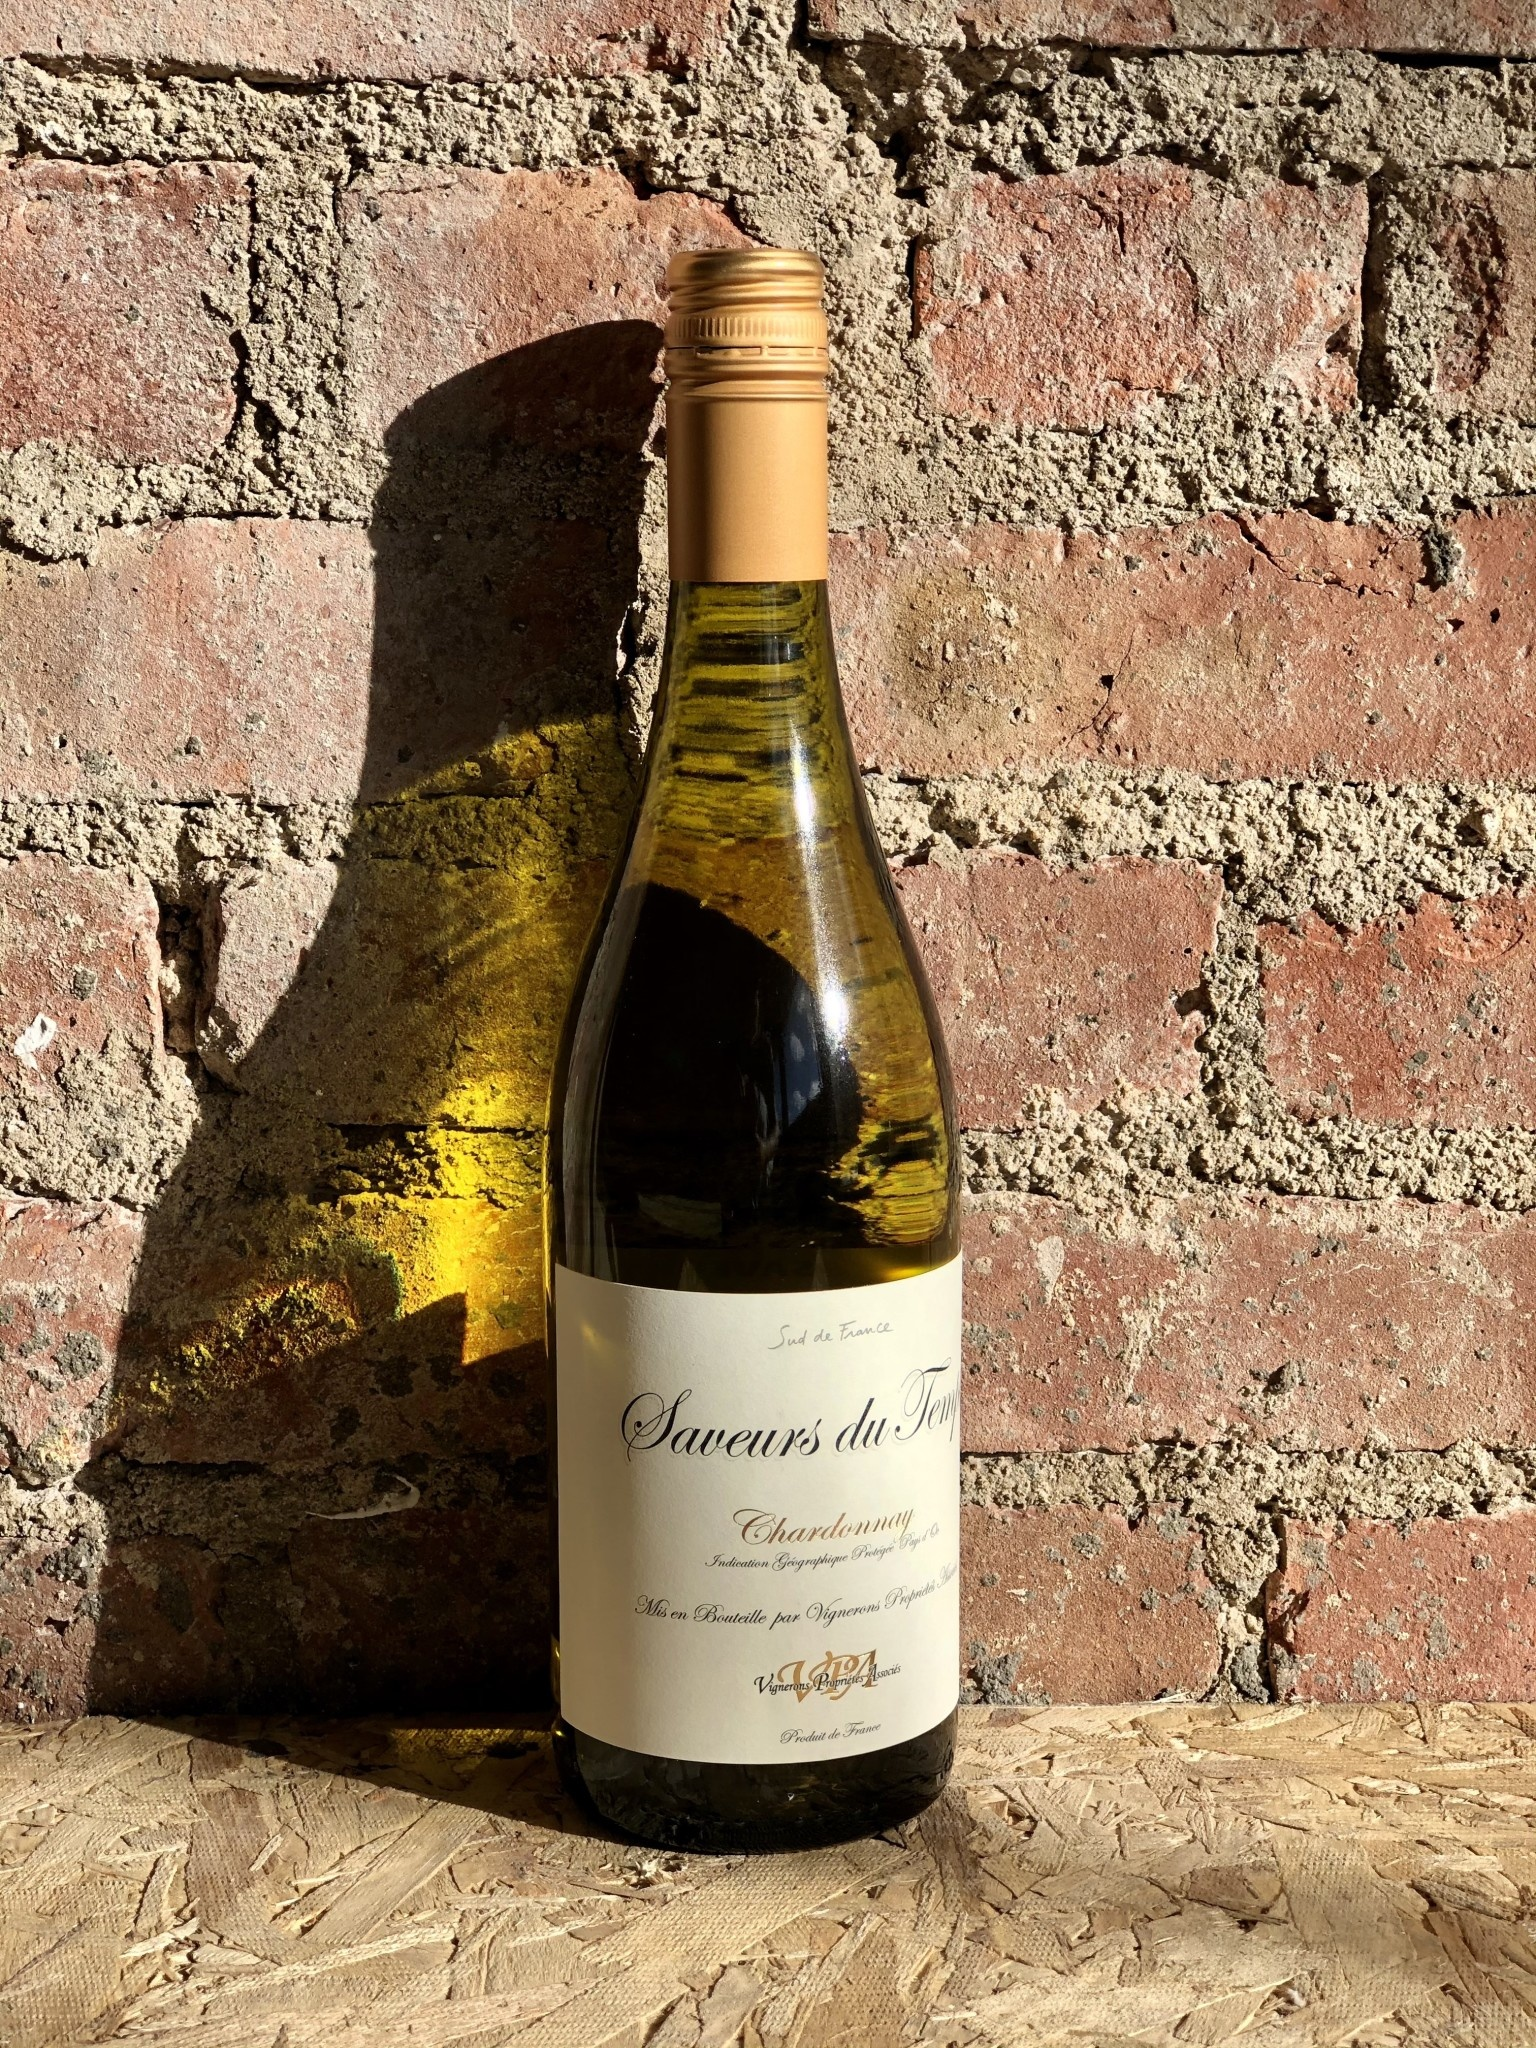 saveurs du temps chardonnay chardonnay pays d oc france 2019